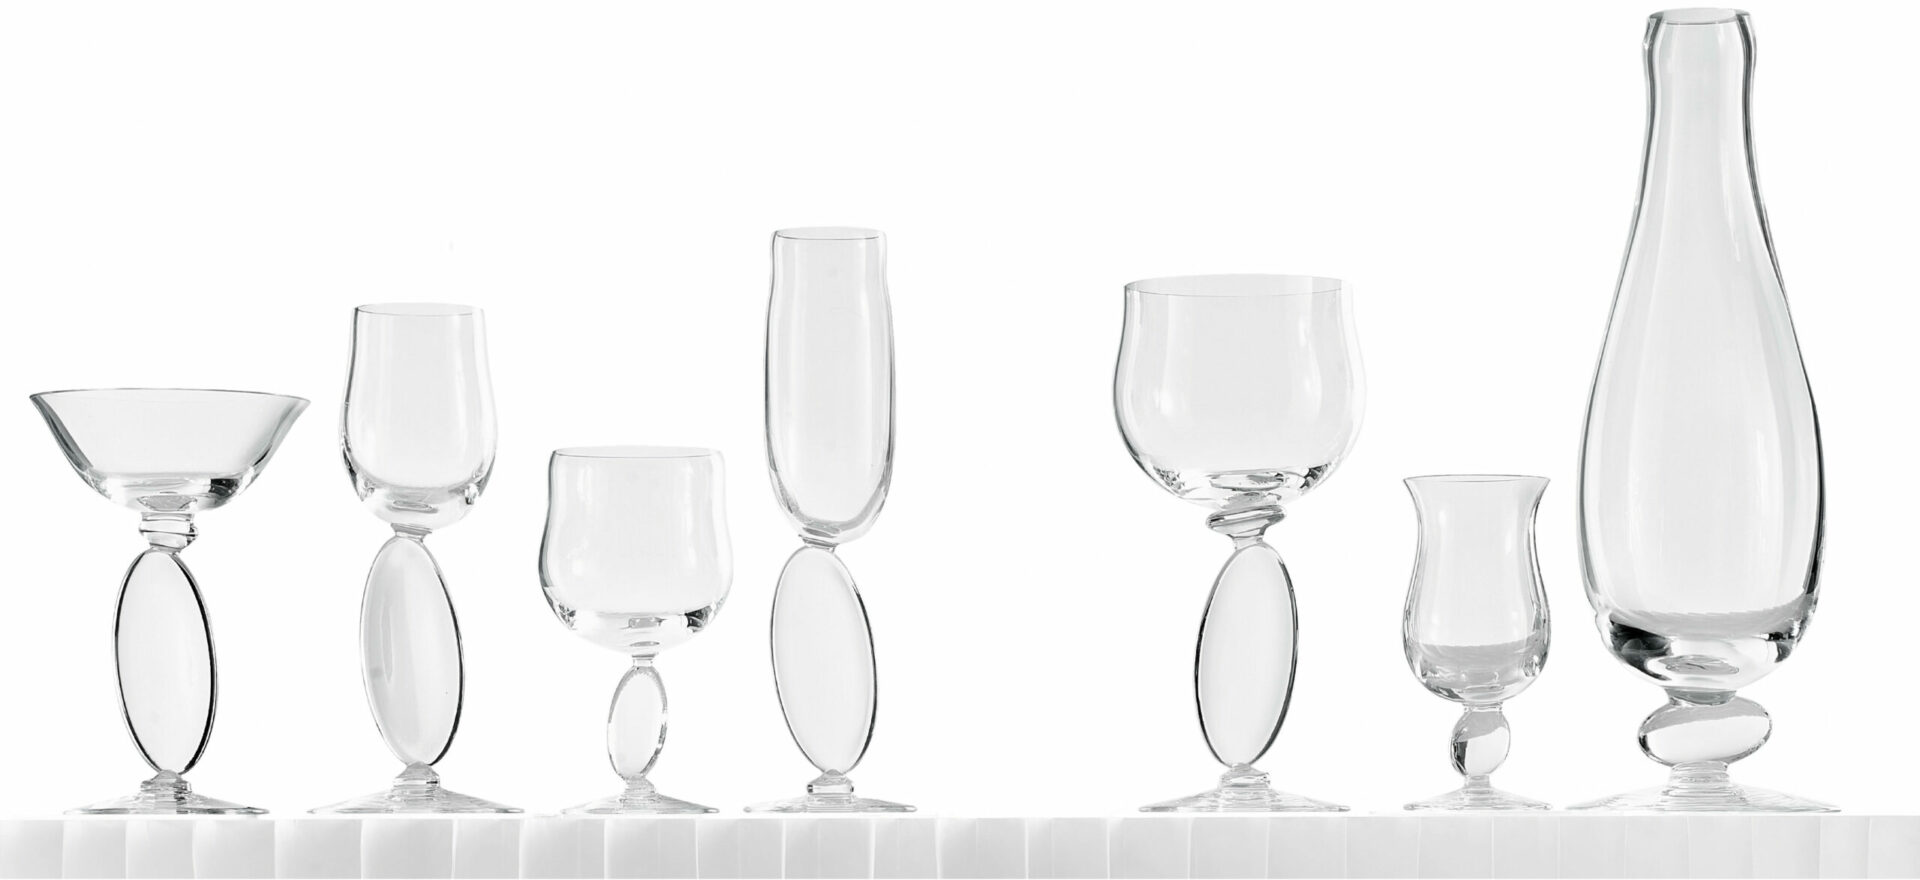 Drops_Paşabahçe_Omnia_glassware design_Mario Trimarchi Design_Products Artworks